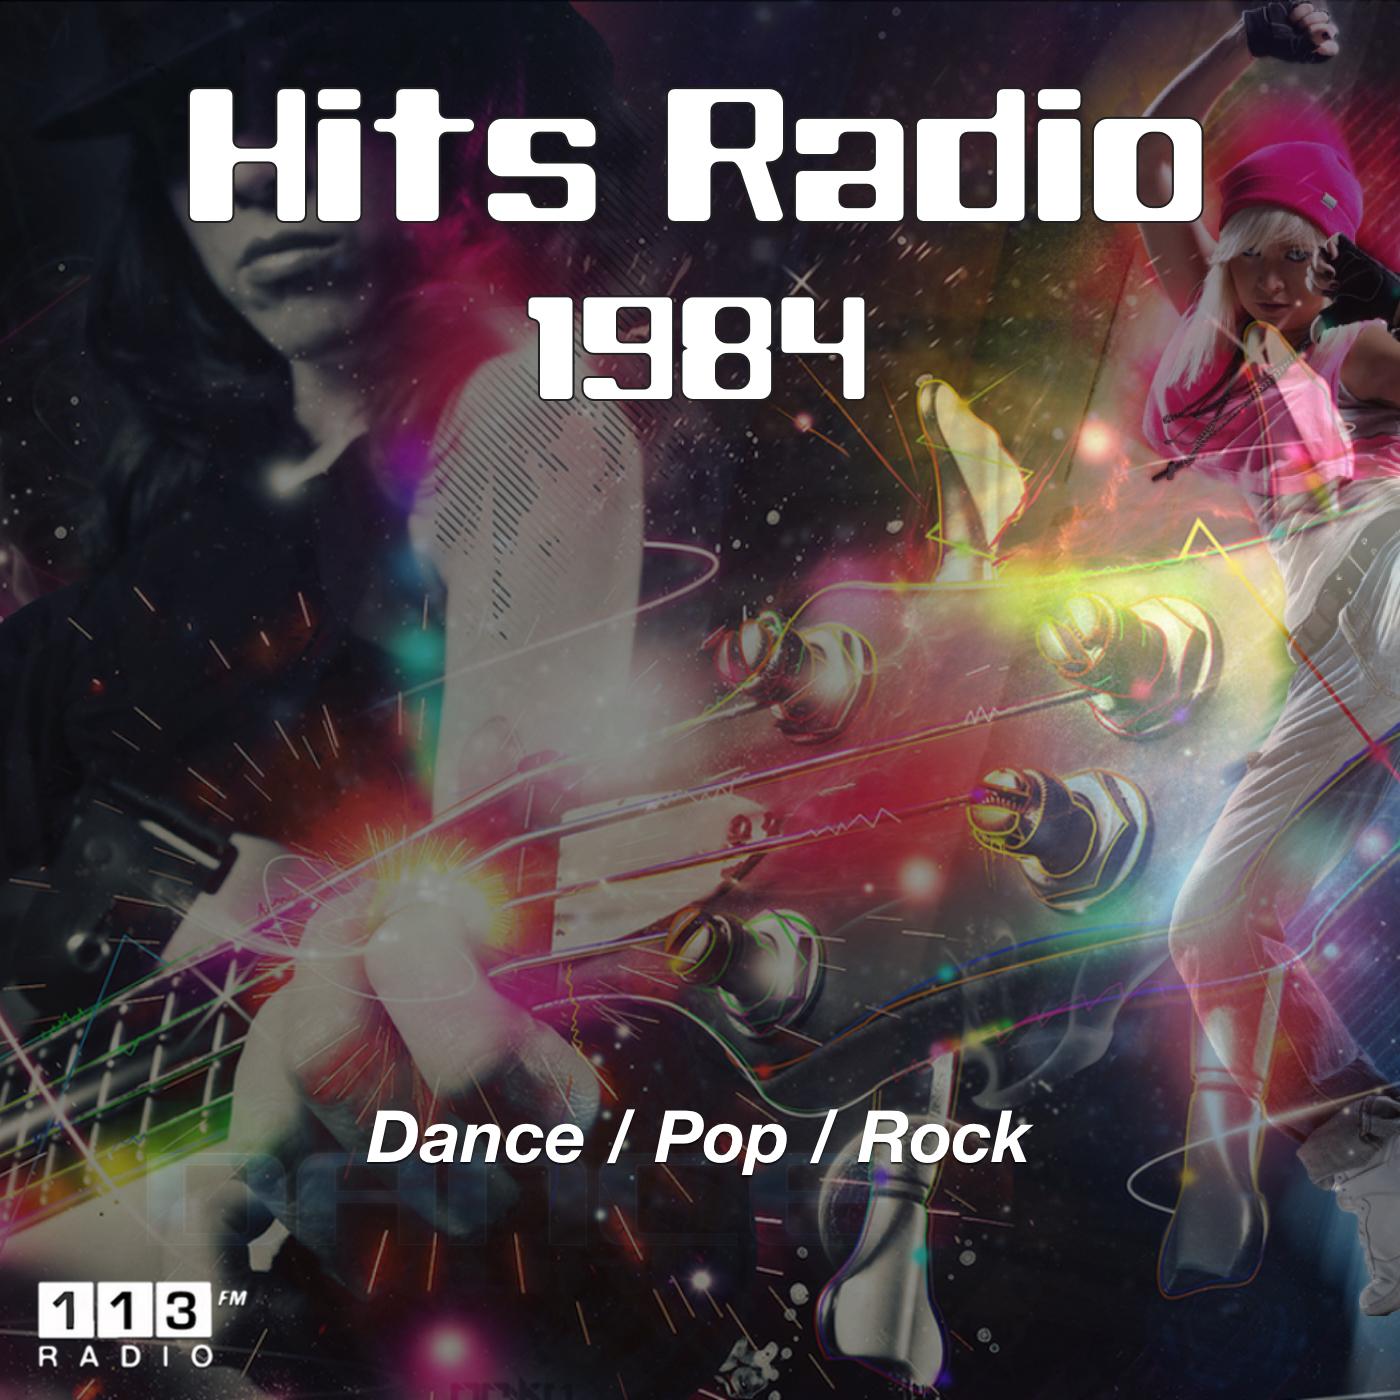 113.fm Hits Radio - 1984